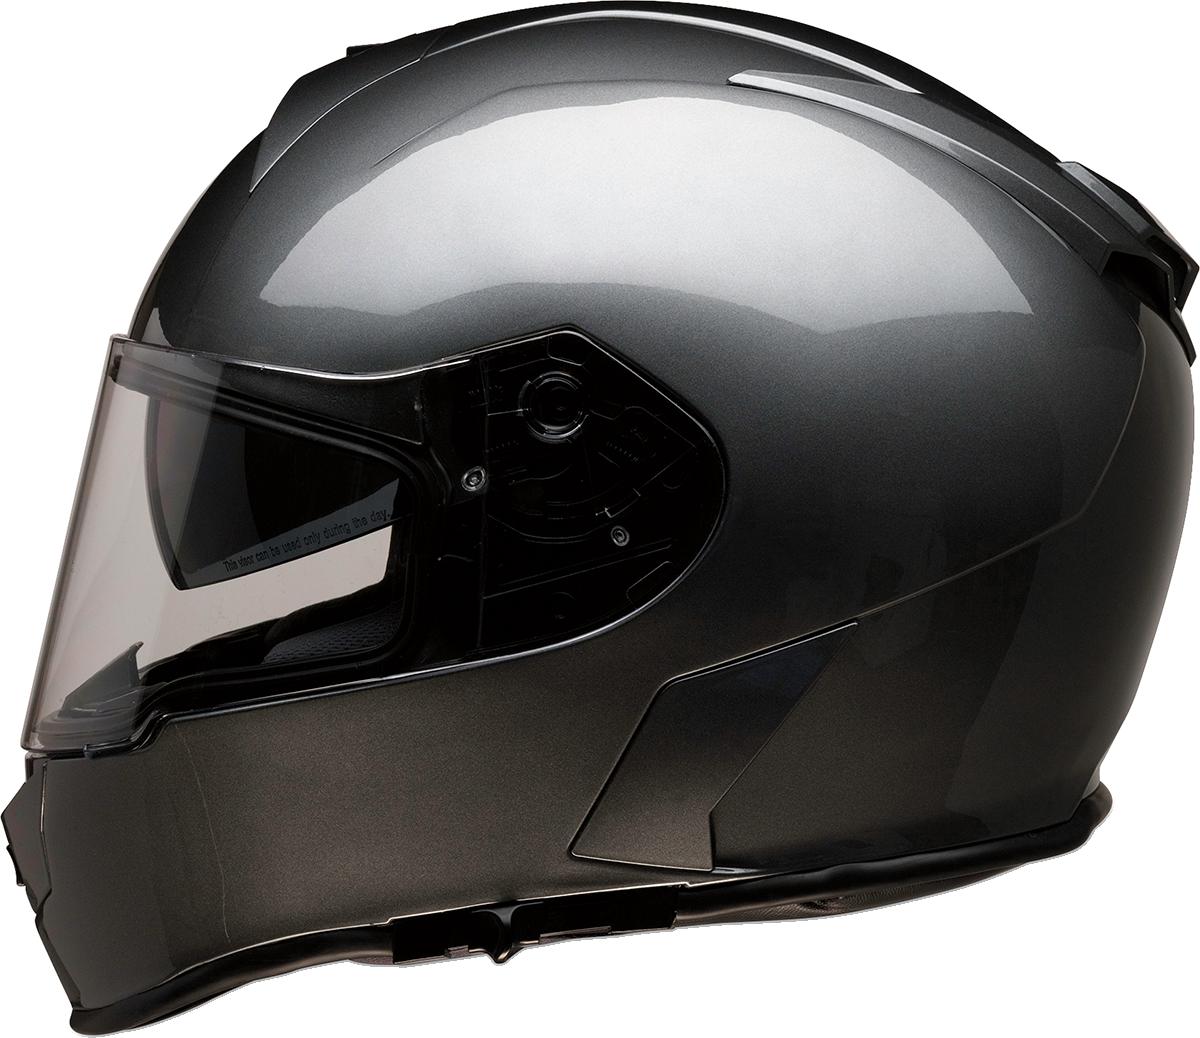 Z1R Warrant Unisex Dark Silver Full Face Motorcycle Riding Street Racing Helmet